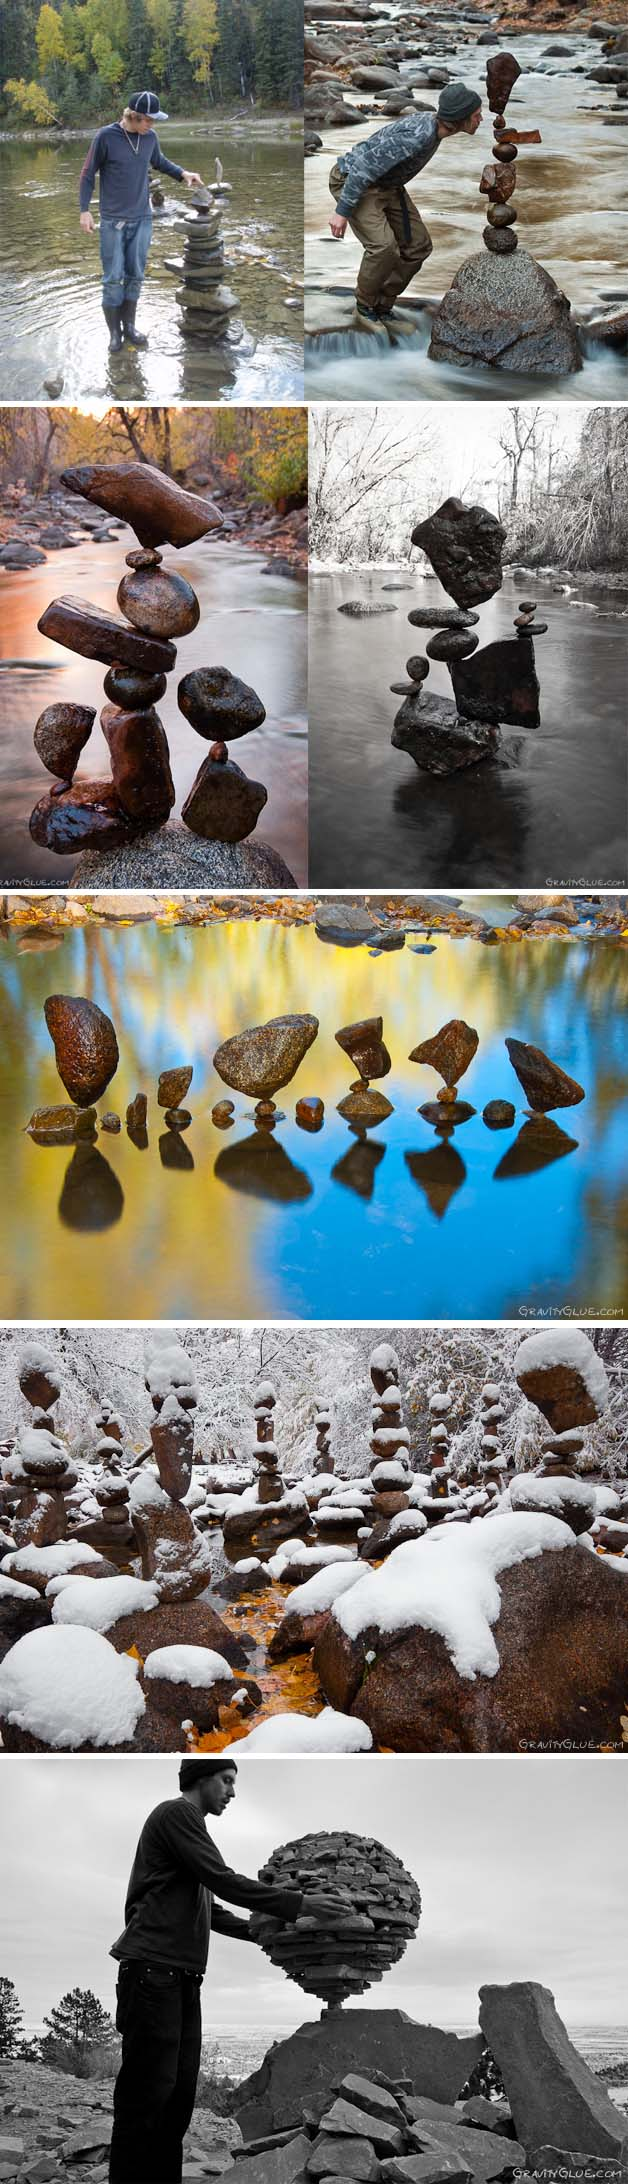 equilibrar pedras michael grab